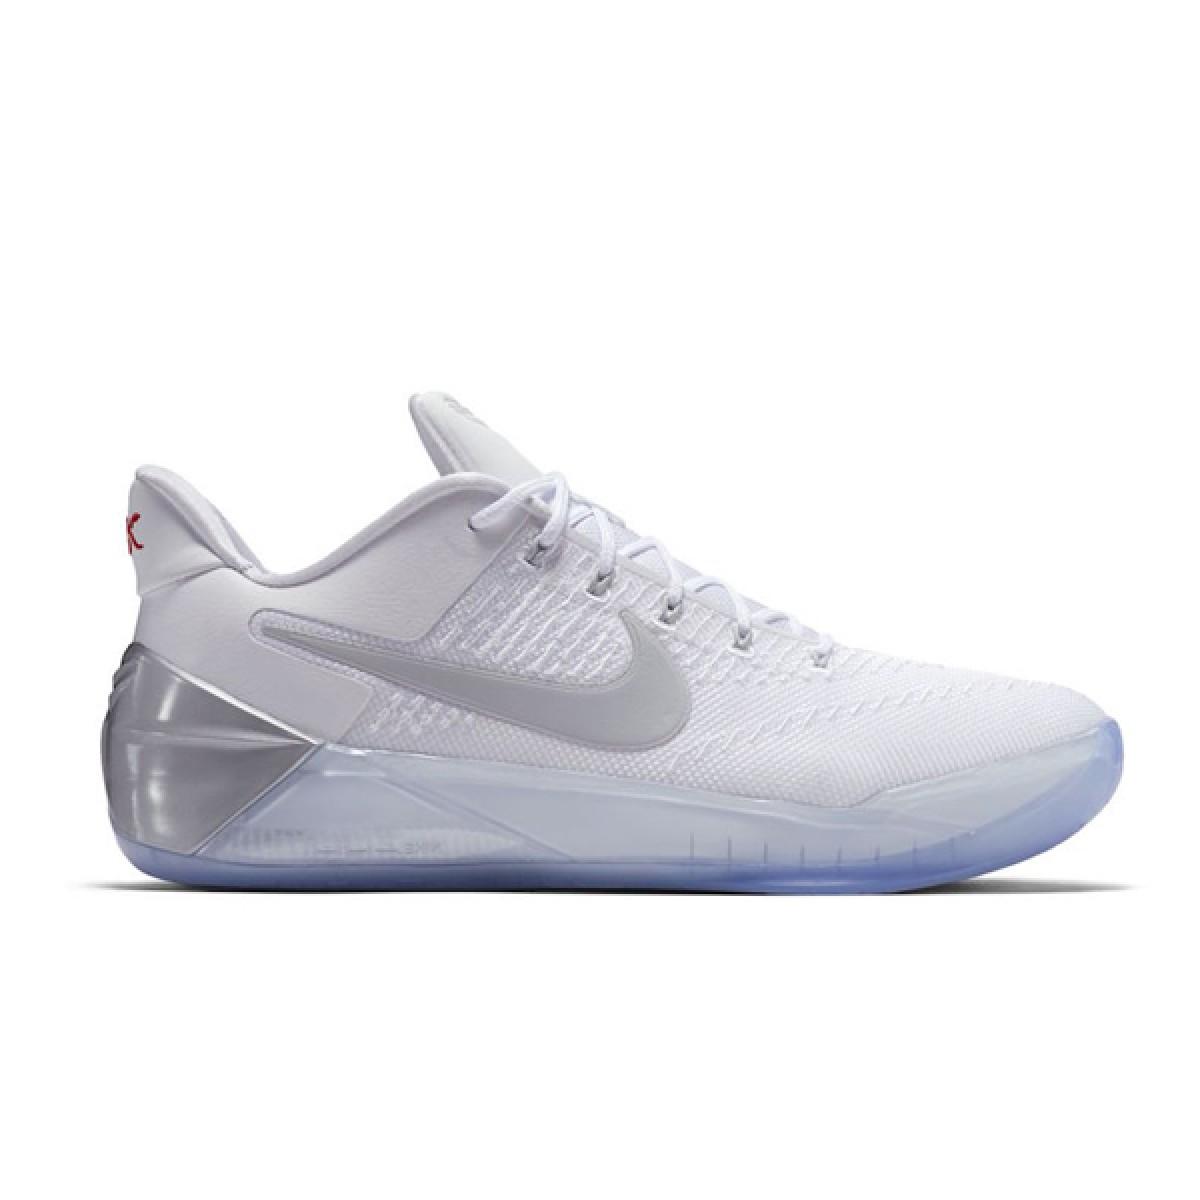 Nike Kobe AD 'White Chrome'